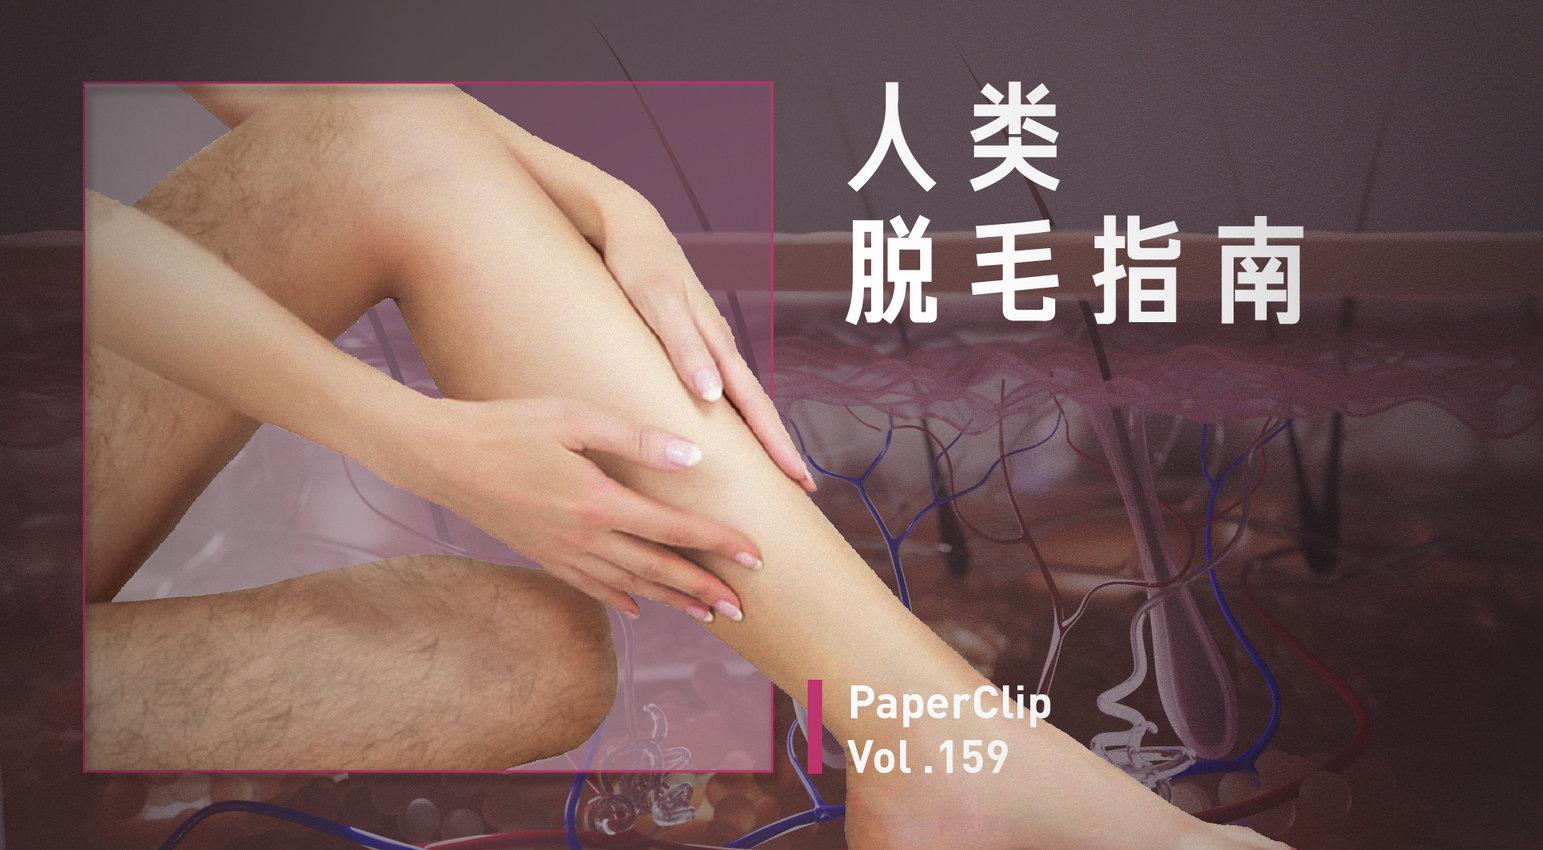 【回形針PaperClip】人類脫毛指南